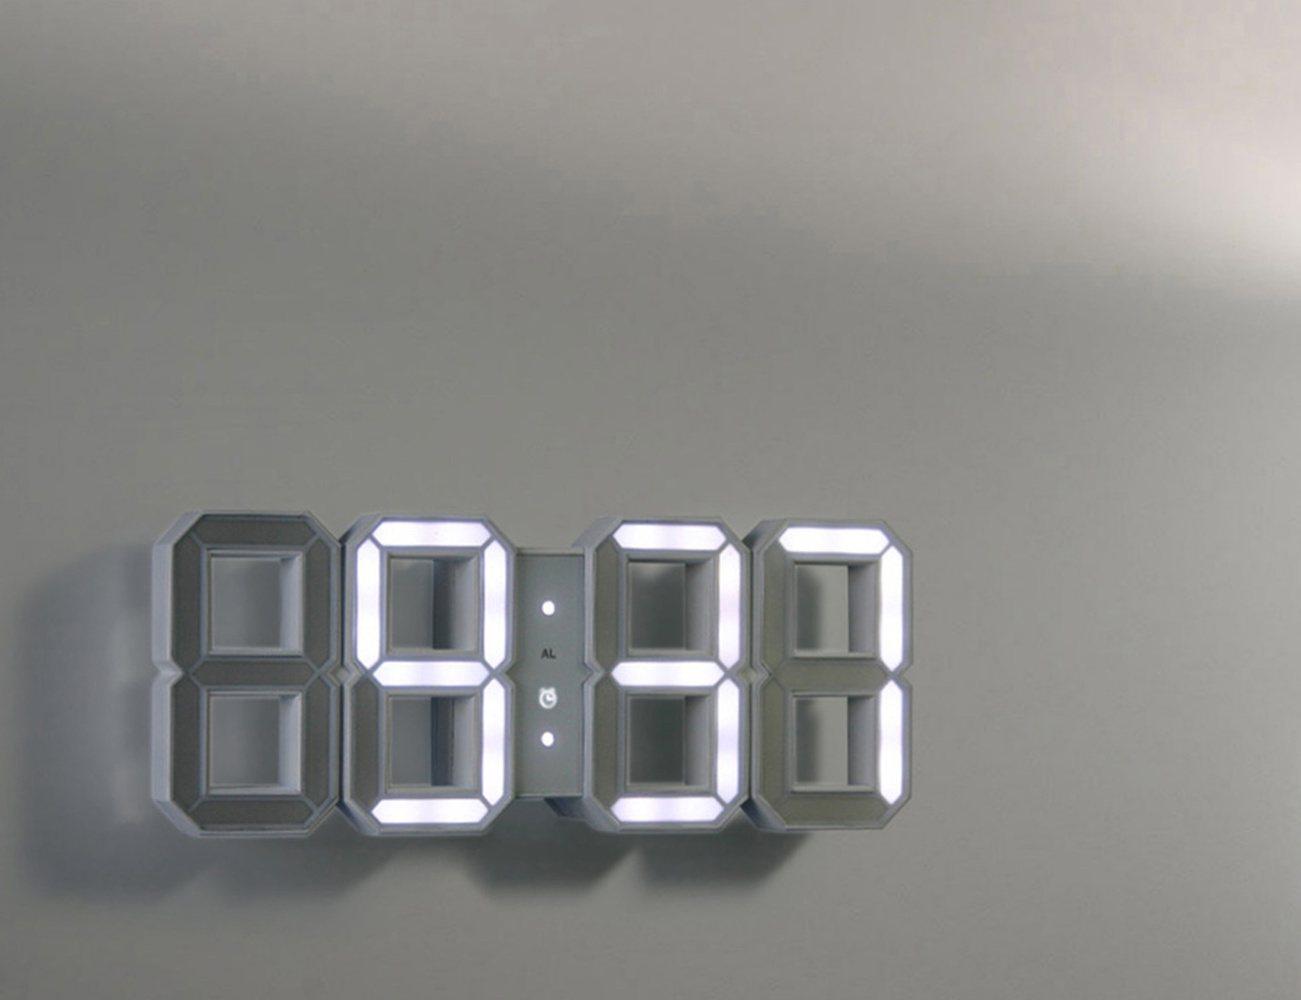 White Amp White Clock 3d Digital Led Black Edition Clock